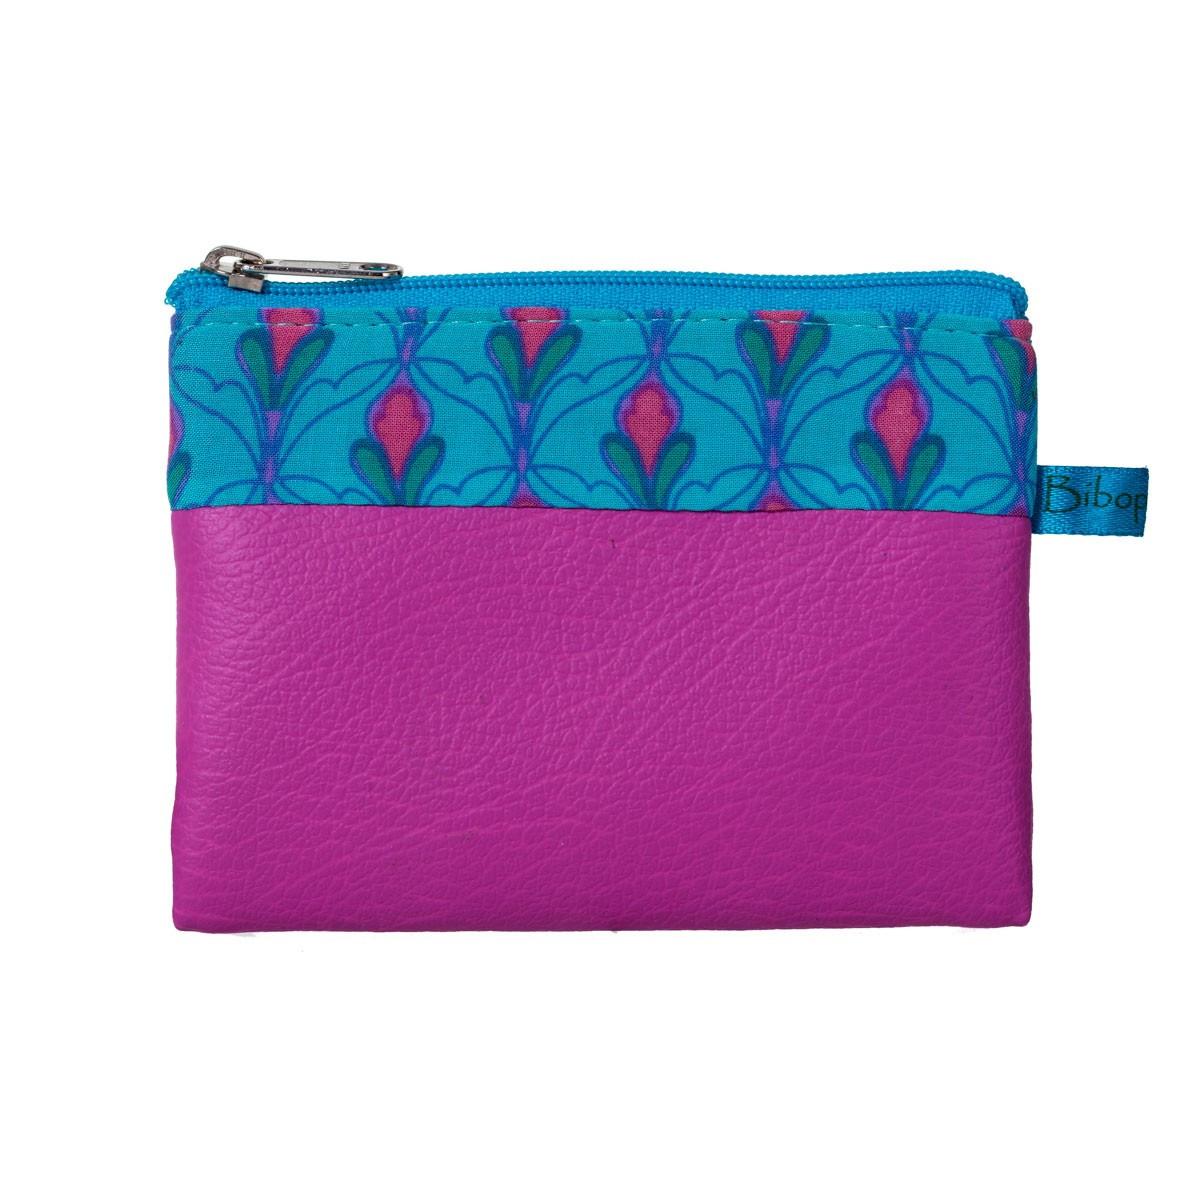 Porte-monnaie pochette zippé fille tissu rose et bleu Tulipe